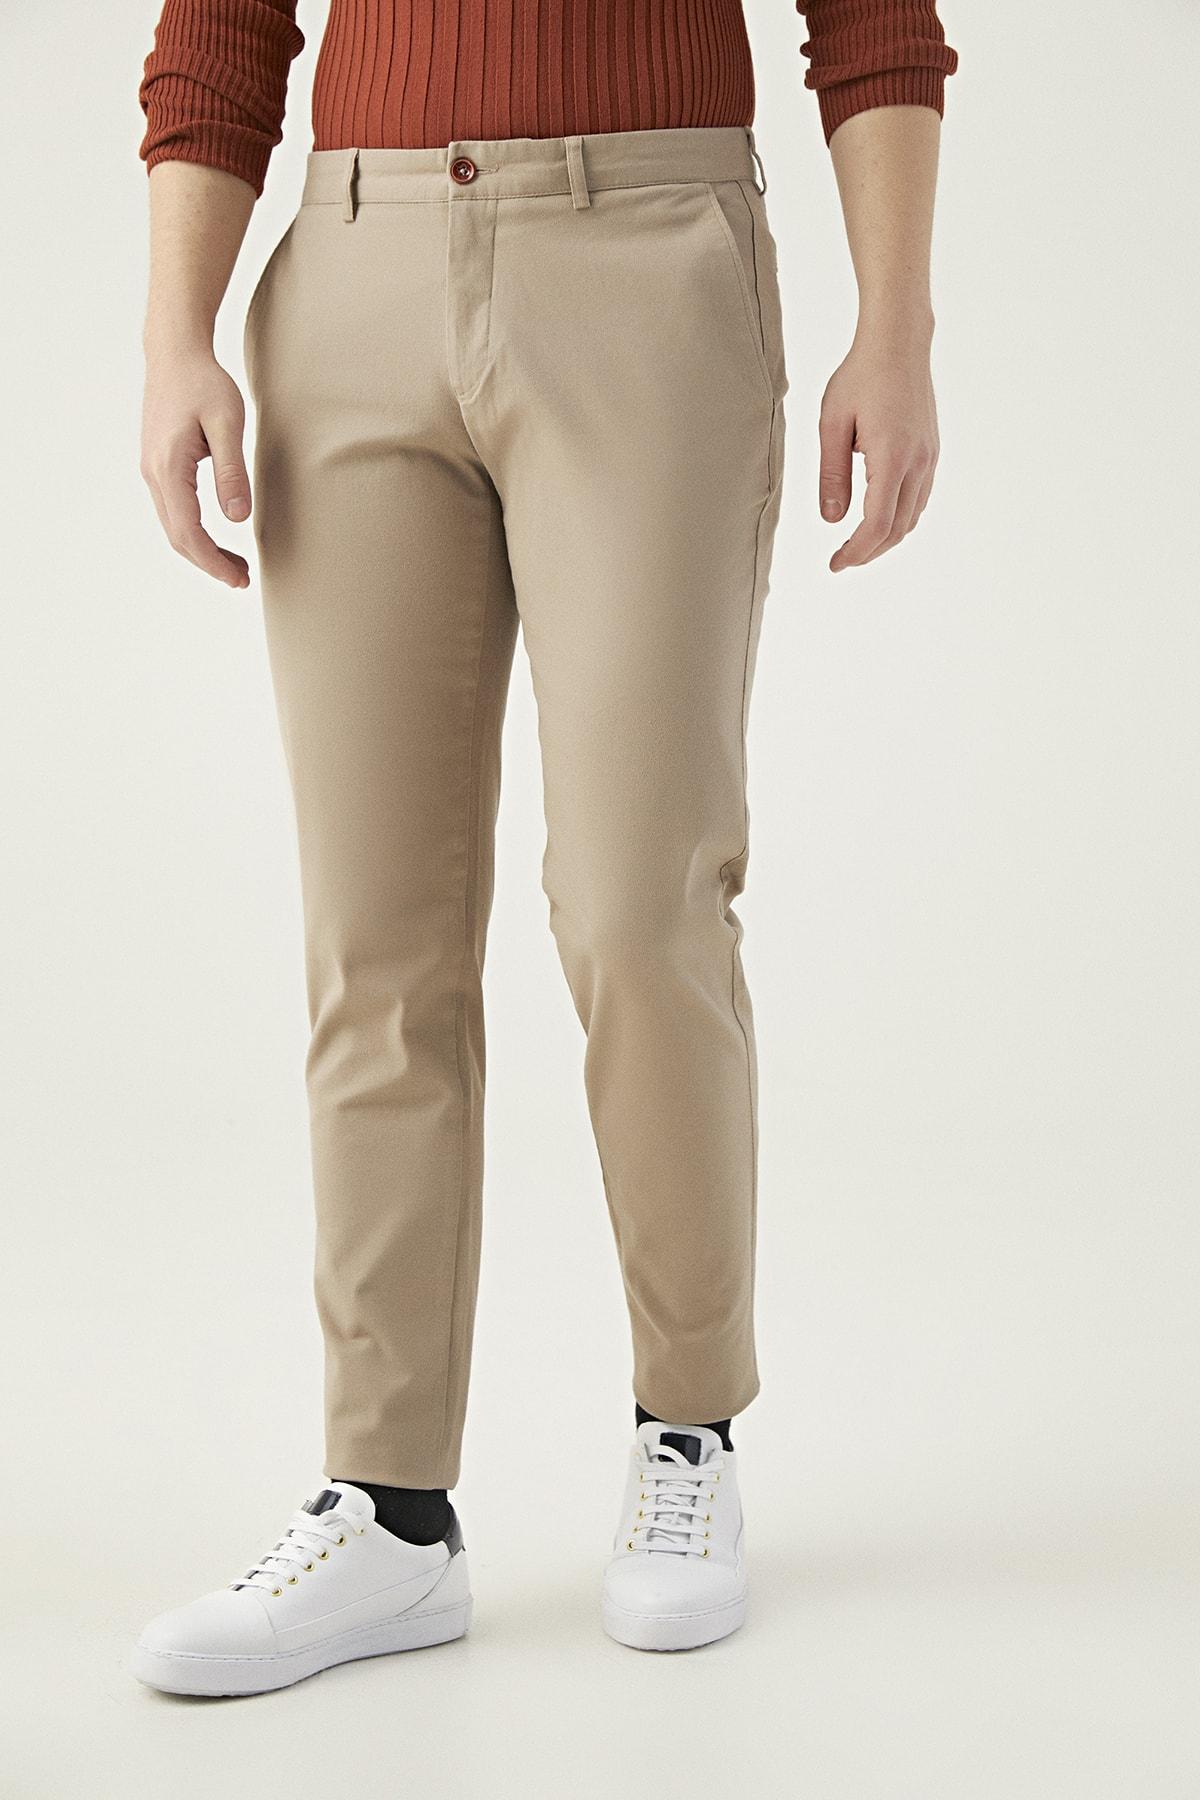 Twn Camel Renk Erkek  Pantolon (Slim Fit) 2